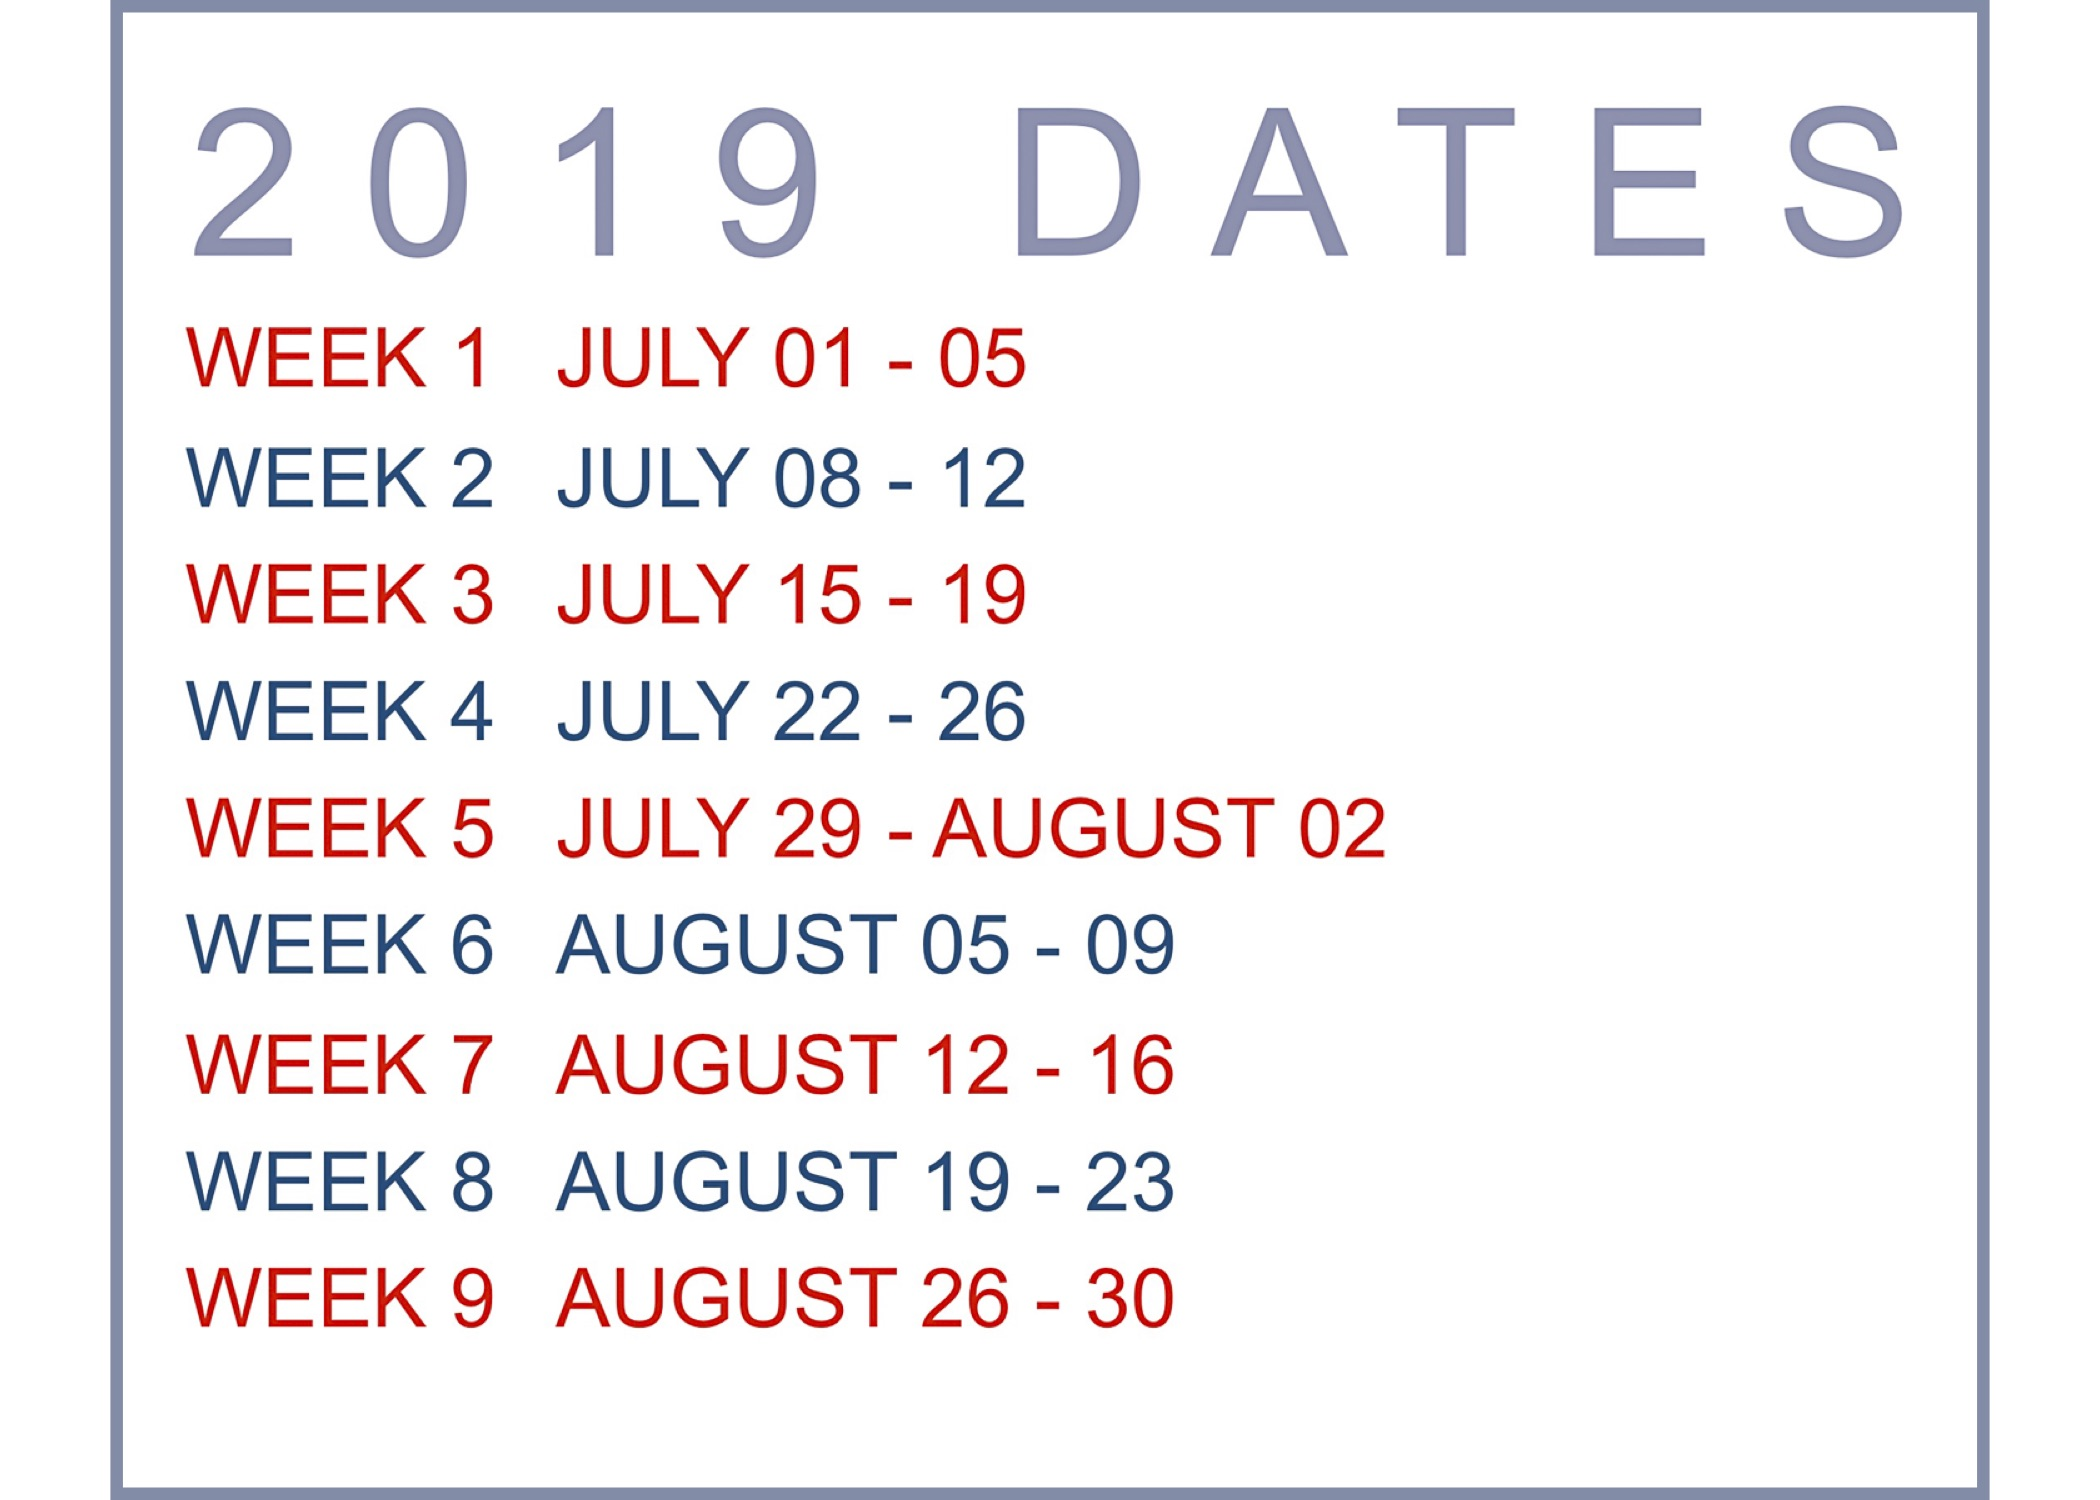 DATES 2019 W:BORDER.jpg